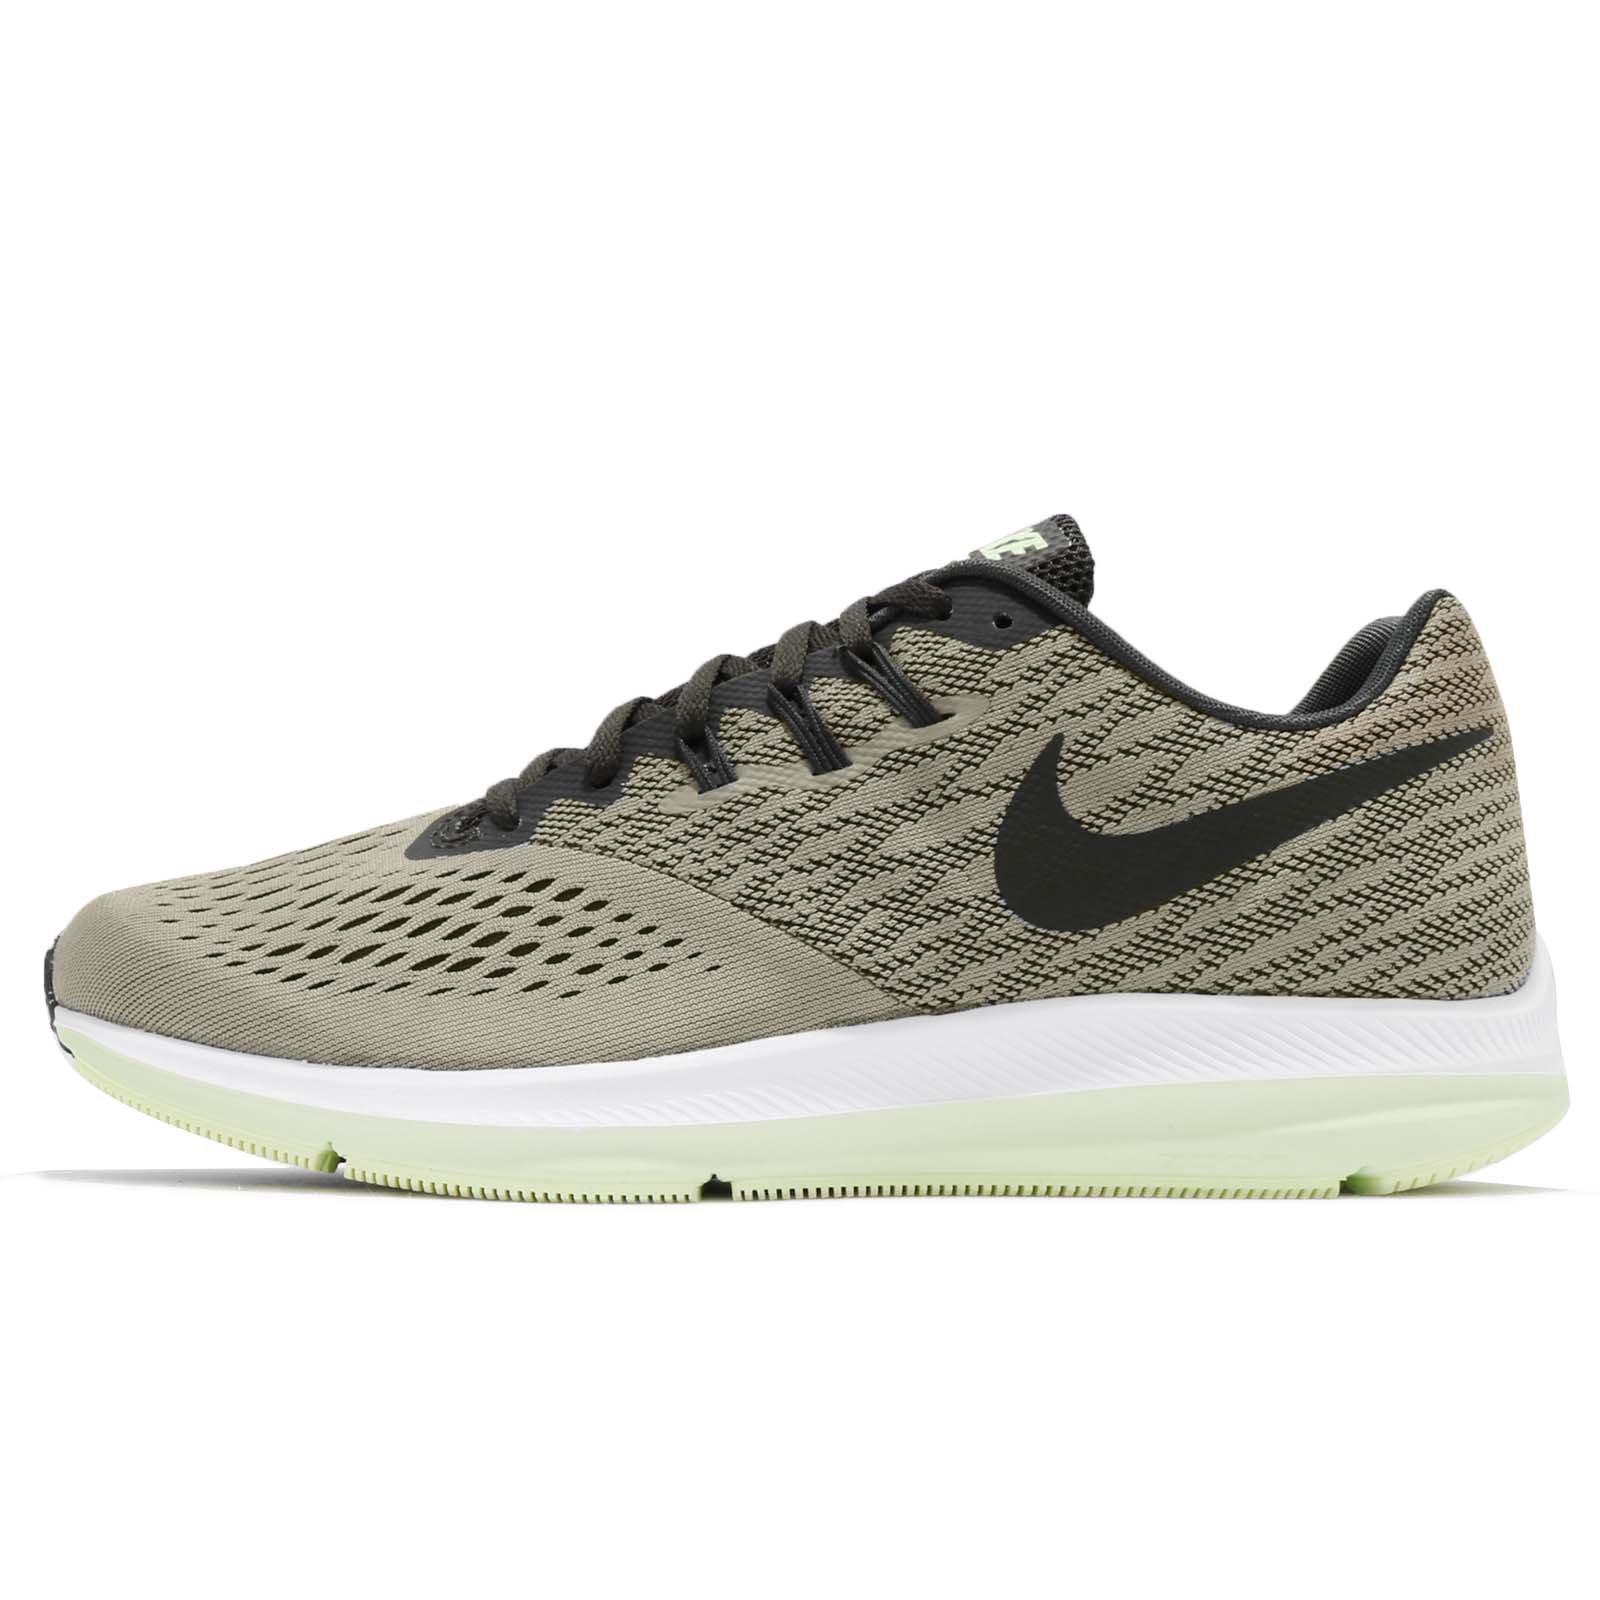 00fa256b63b18 Nike Men's Air Zoom Winflo 4 Running Shoe (13, Dark Stucco/Sequoia-Barely  Volt-White)